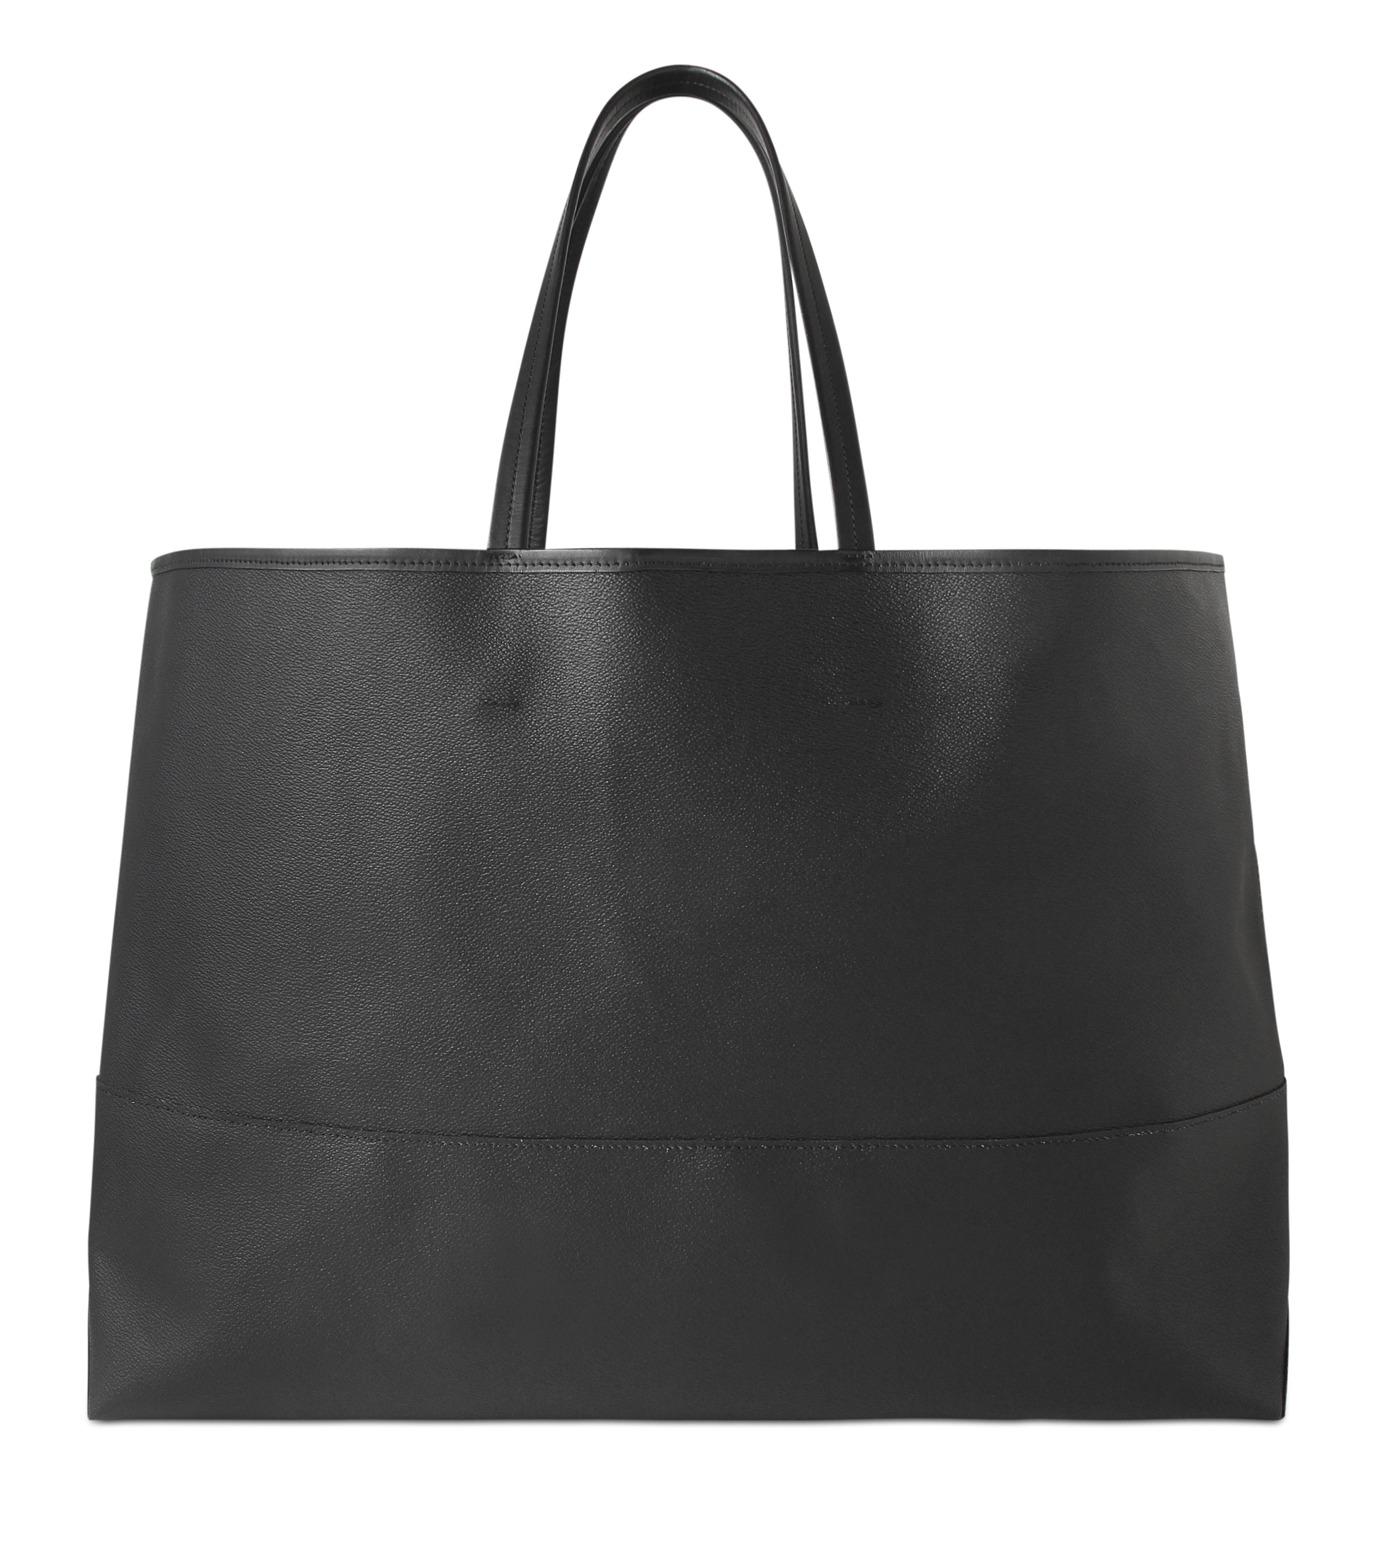 HL HEDDIE LOVU(エイチエル・エディールーヴ)のBIG TOTE BAG-BLACK(バッグ/bag)-17A90004-13 拡大詳細画像1